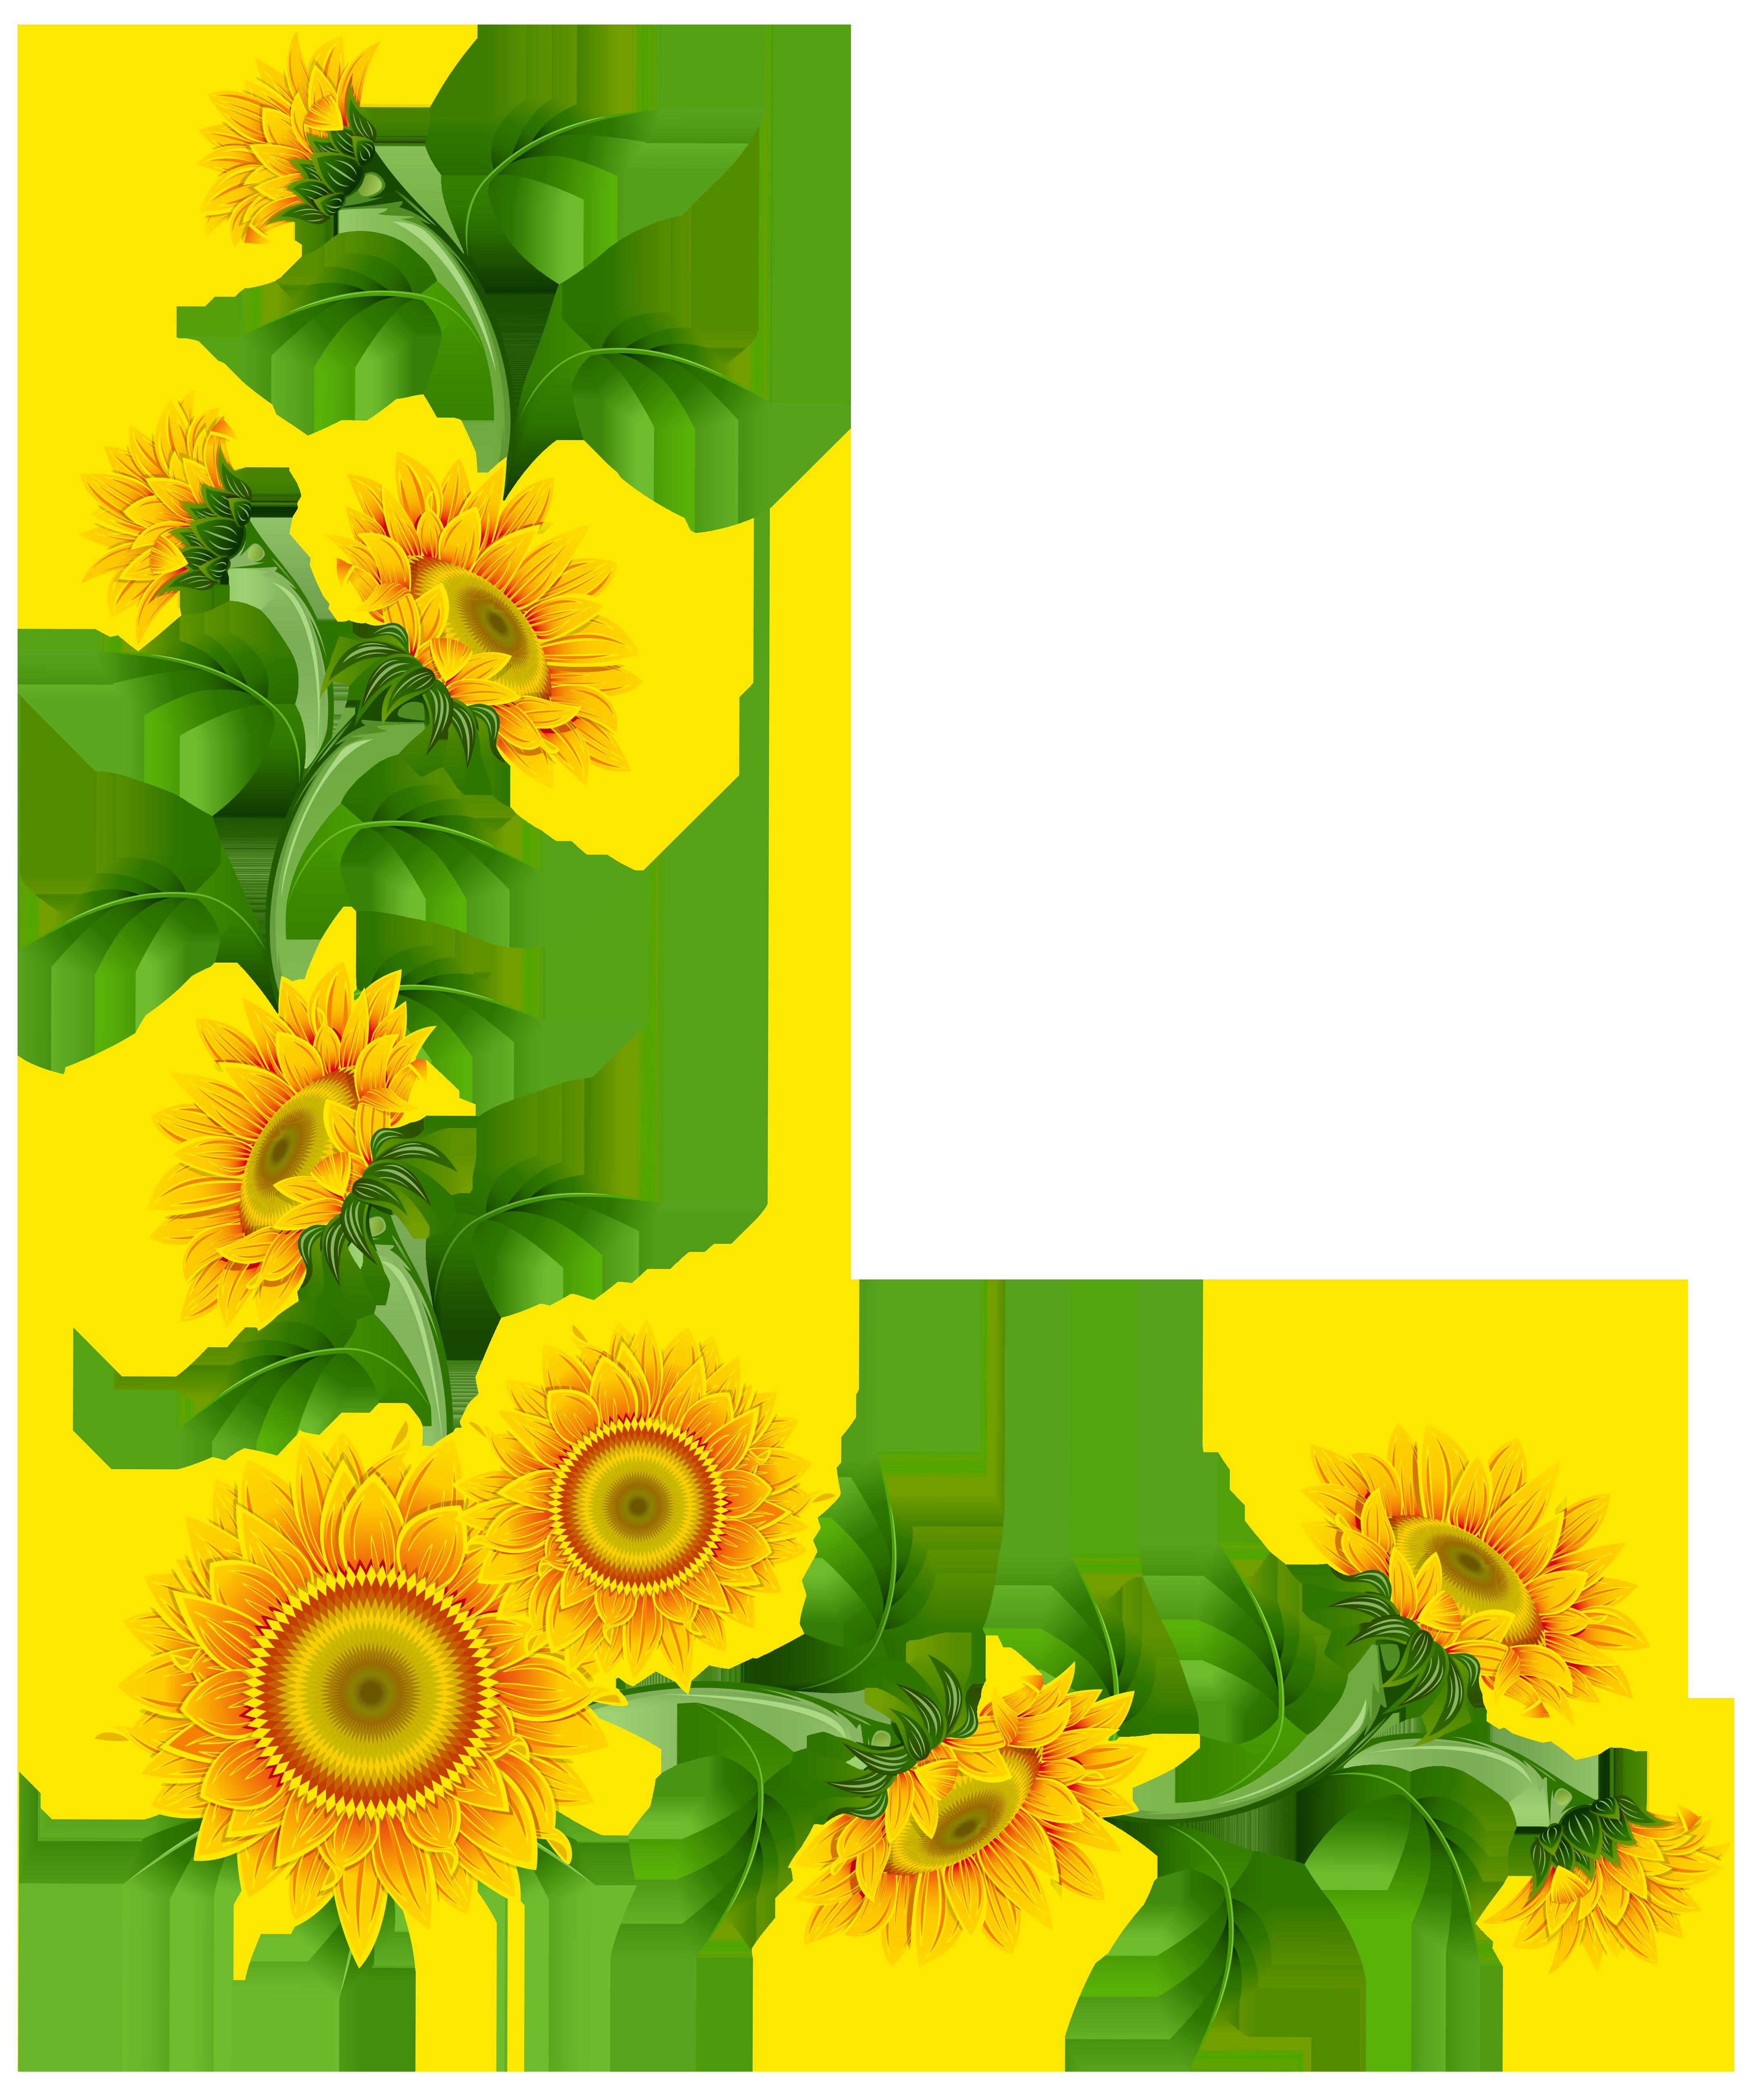 4316x5130 Free Sunflower Border Clipart Image